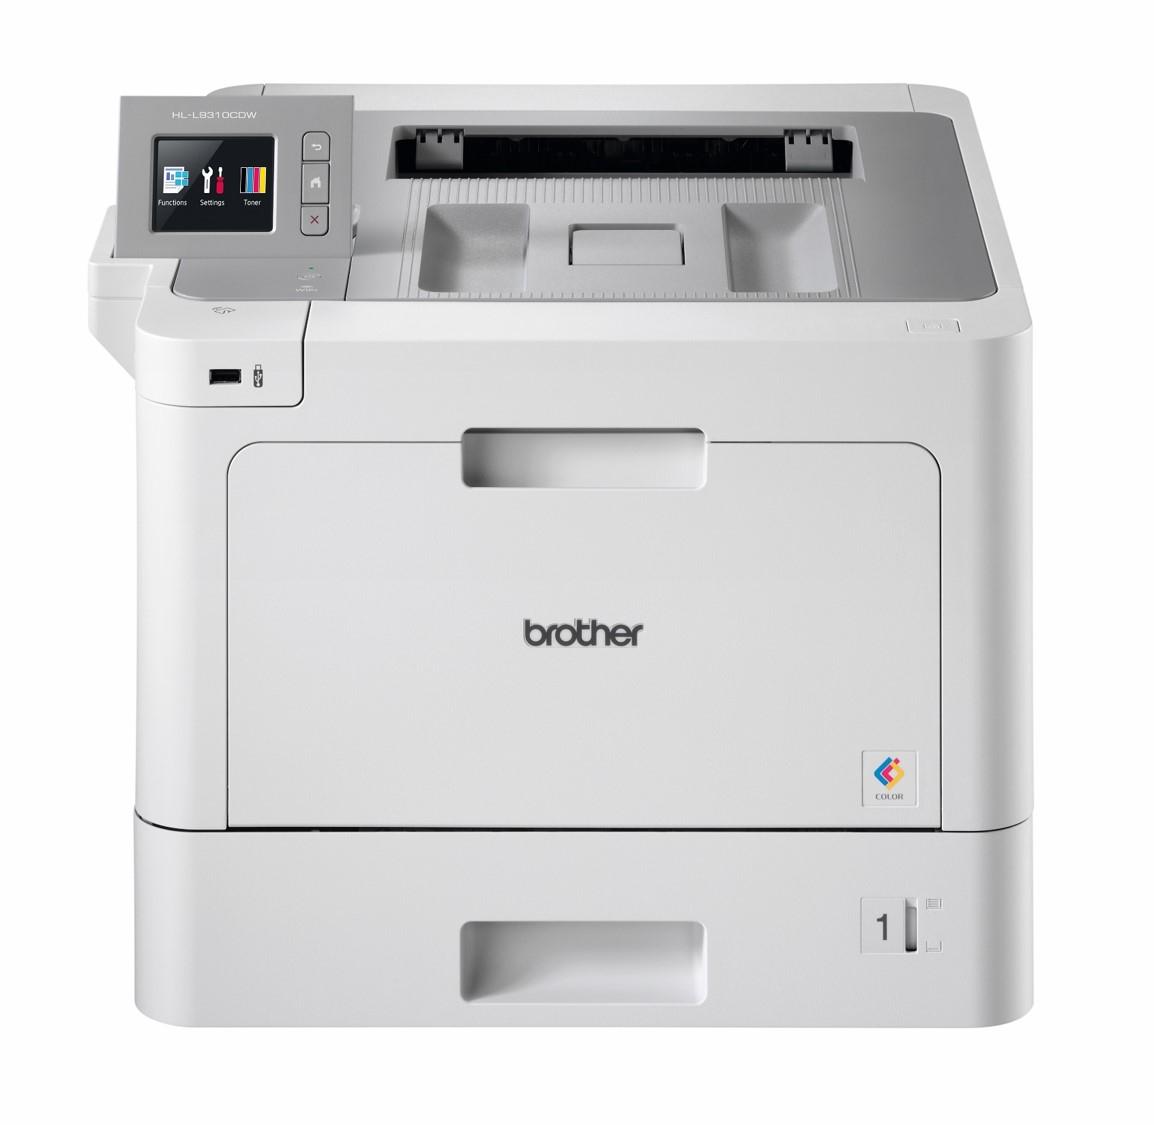 Brother HL-L9310CDW laserskriver Farge 2400 x 600 DPI A4 Wi-Fi